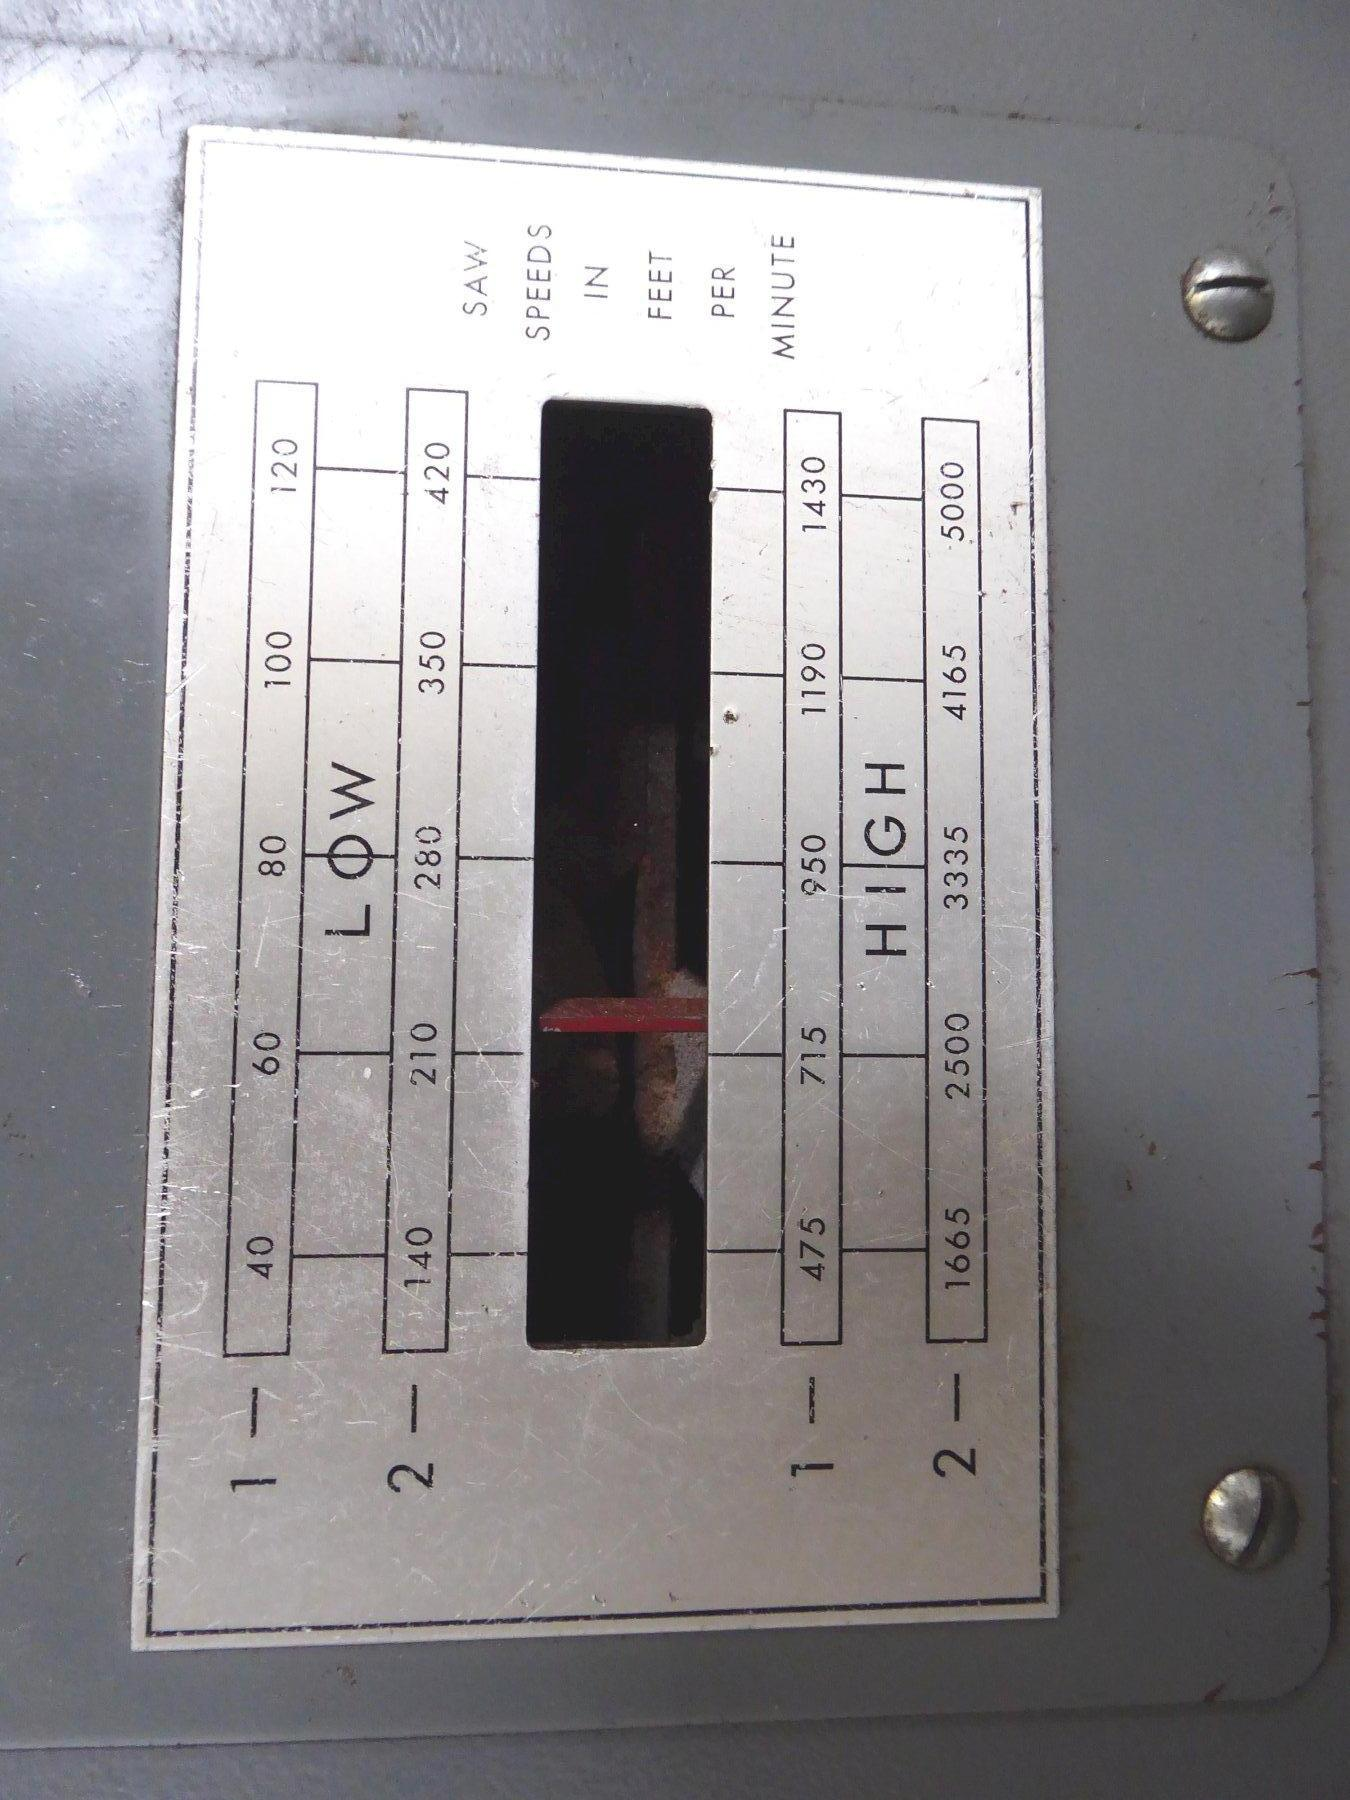 "24"" Grob Vertical Band Saw No. 4V-24, Air-Hydraulic Table Feed, 40-5000 FPM, 28"" x 24"" Tbl., 12"" Under Guide, Clean"